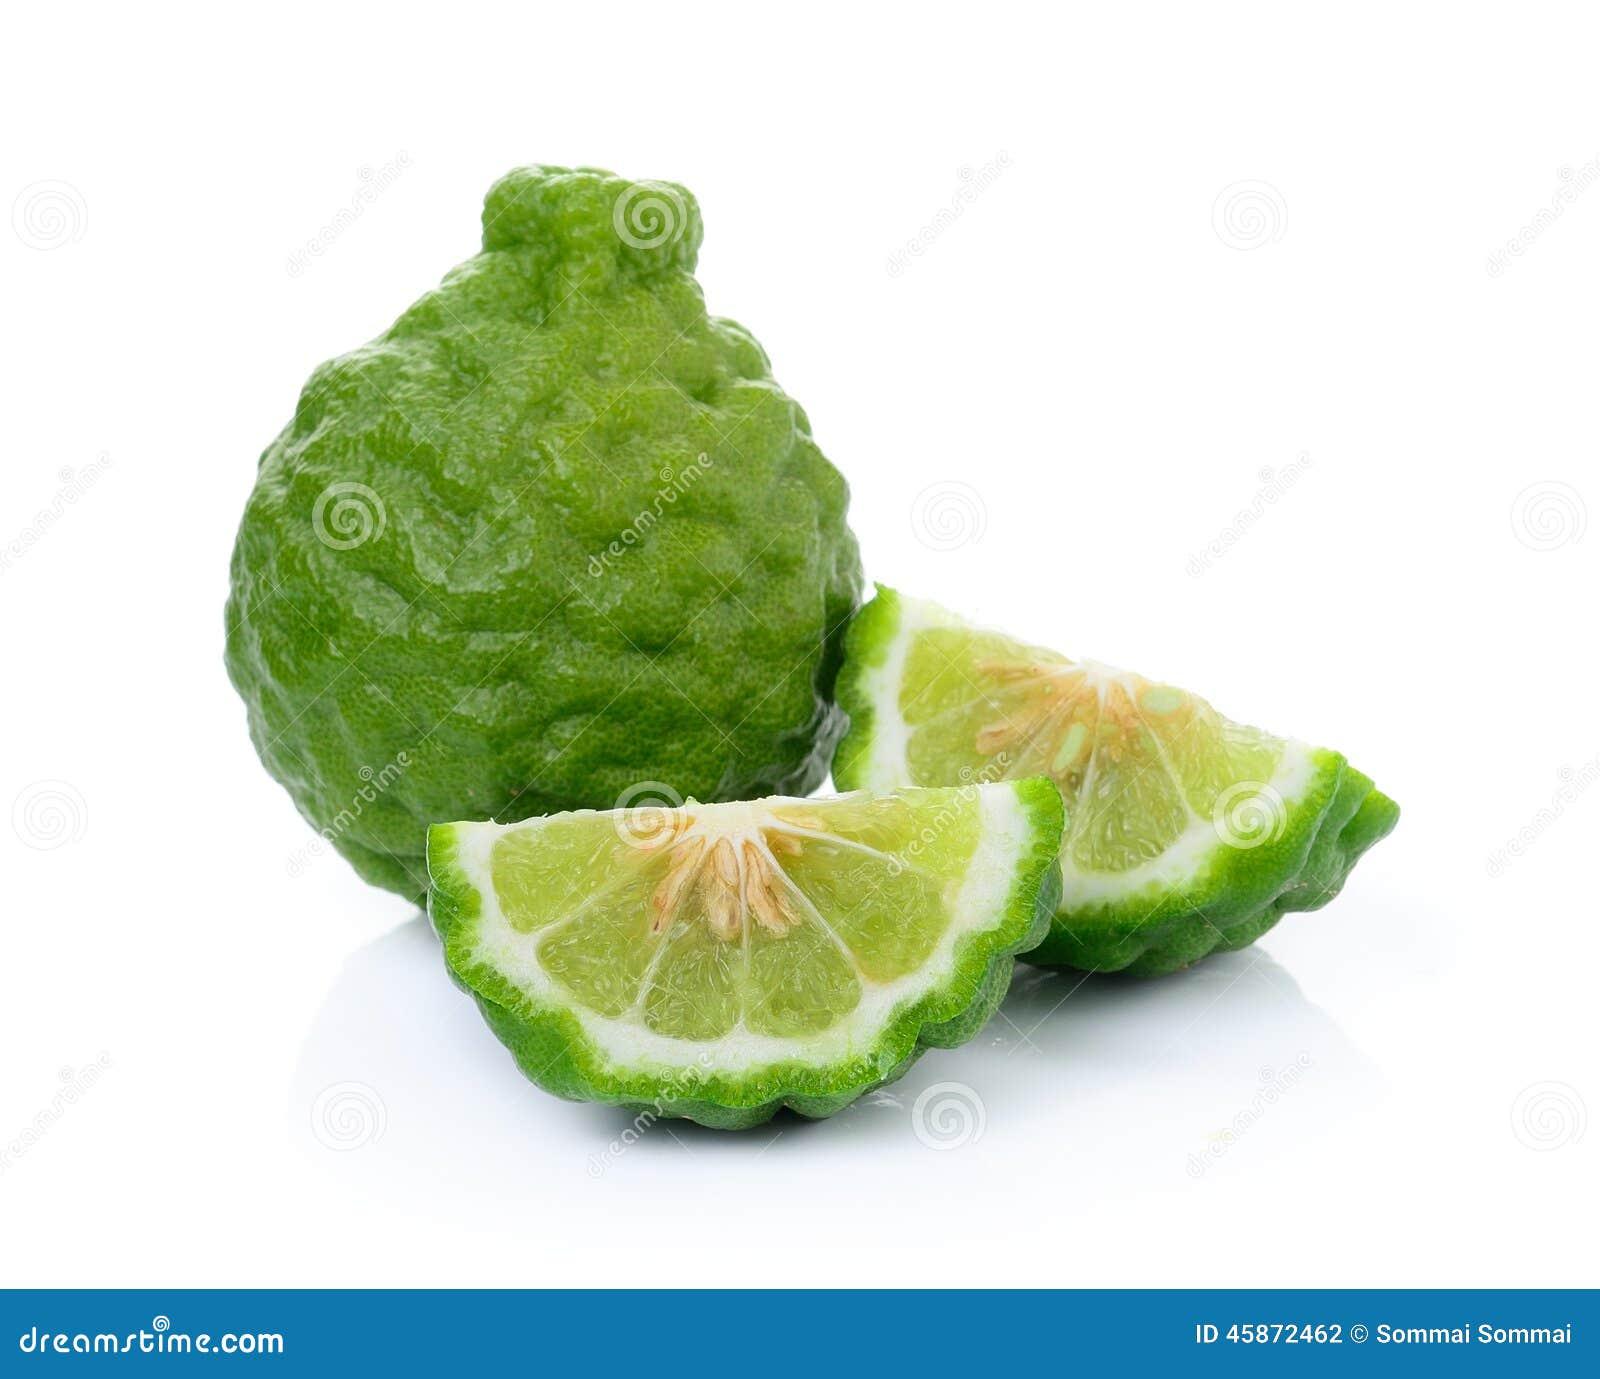 how to make kaffir lime leaf powder